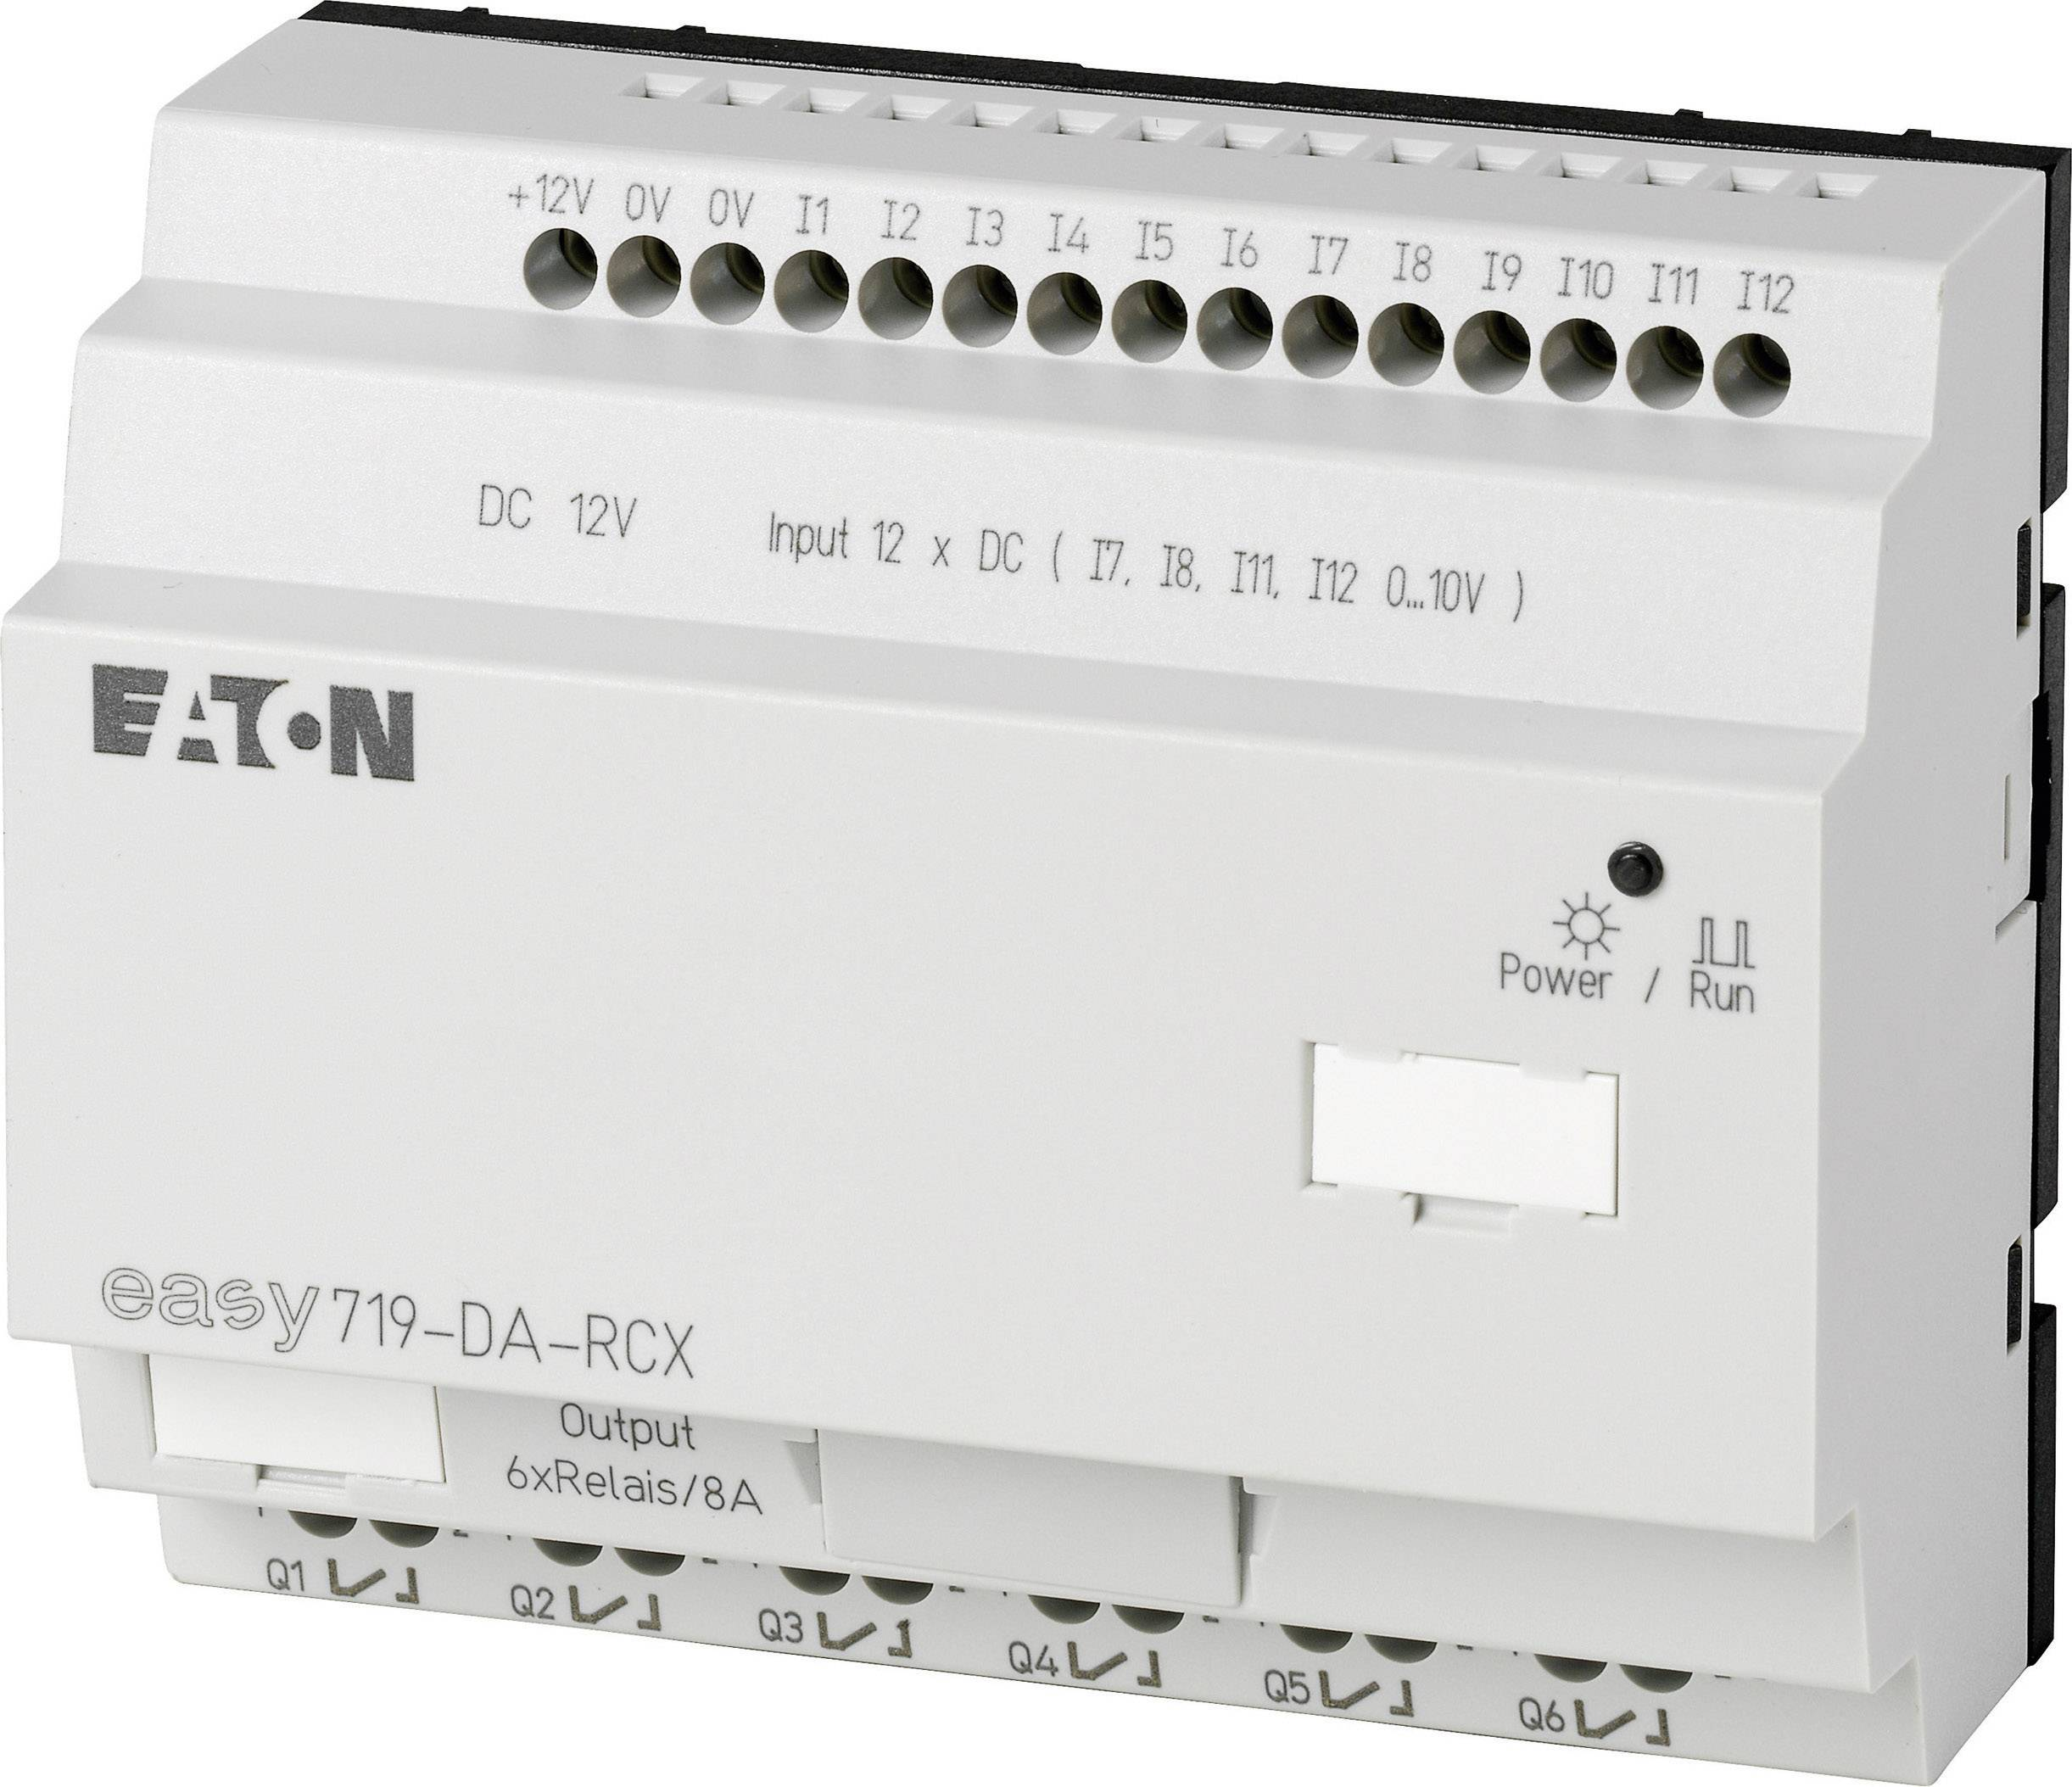 Riadiacimodul Eaton easy 719-DA-RCX 274118, 12 V/DC